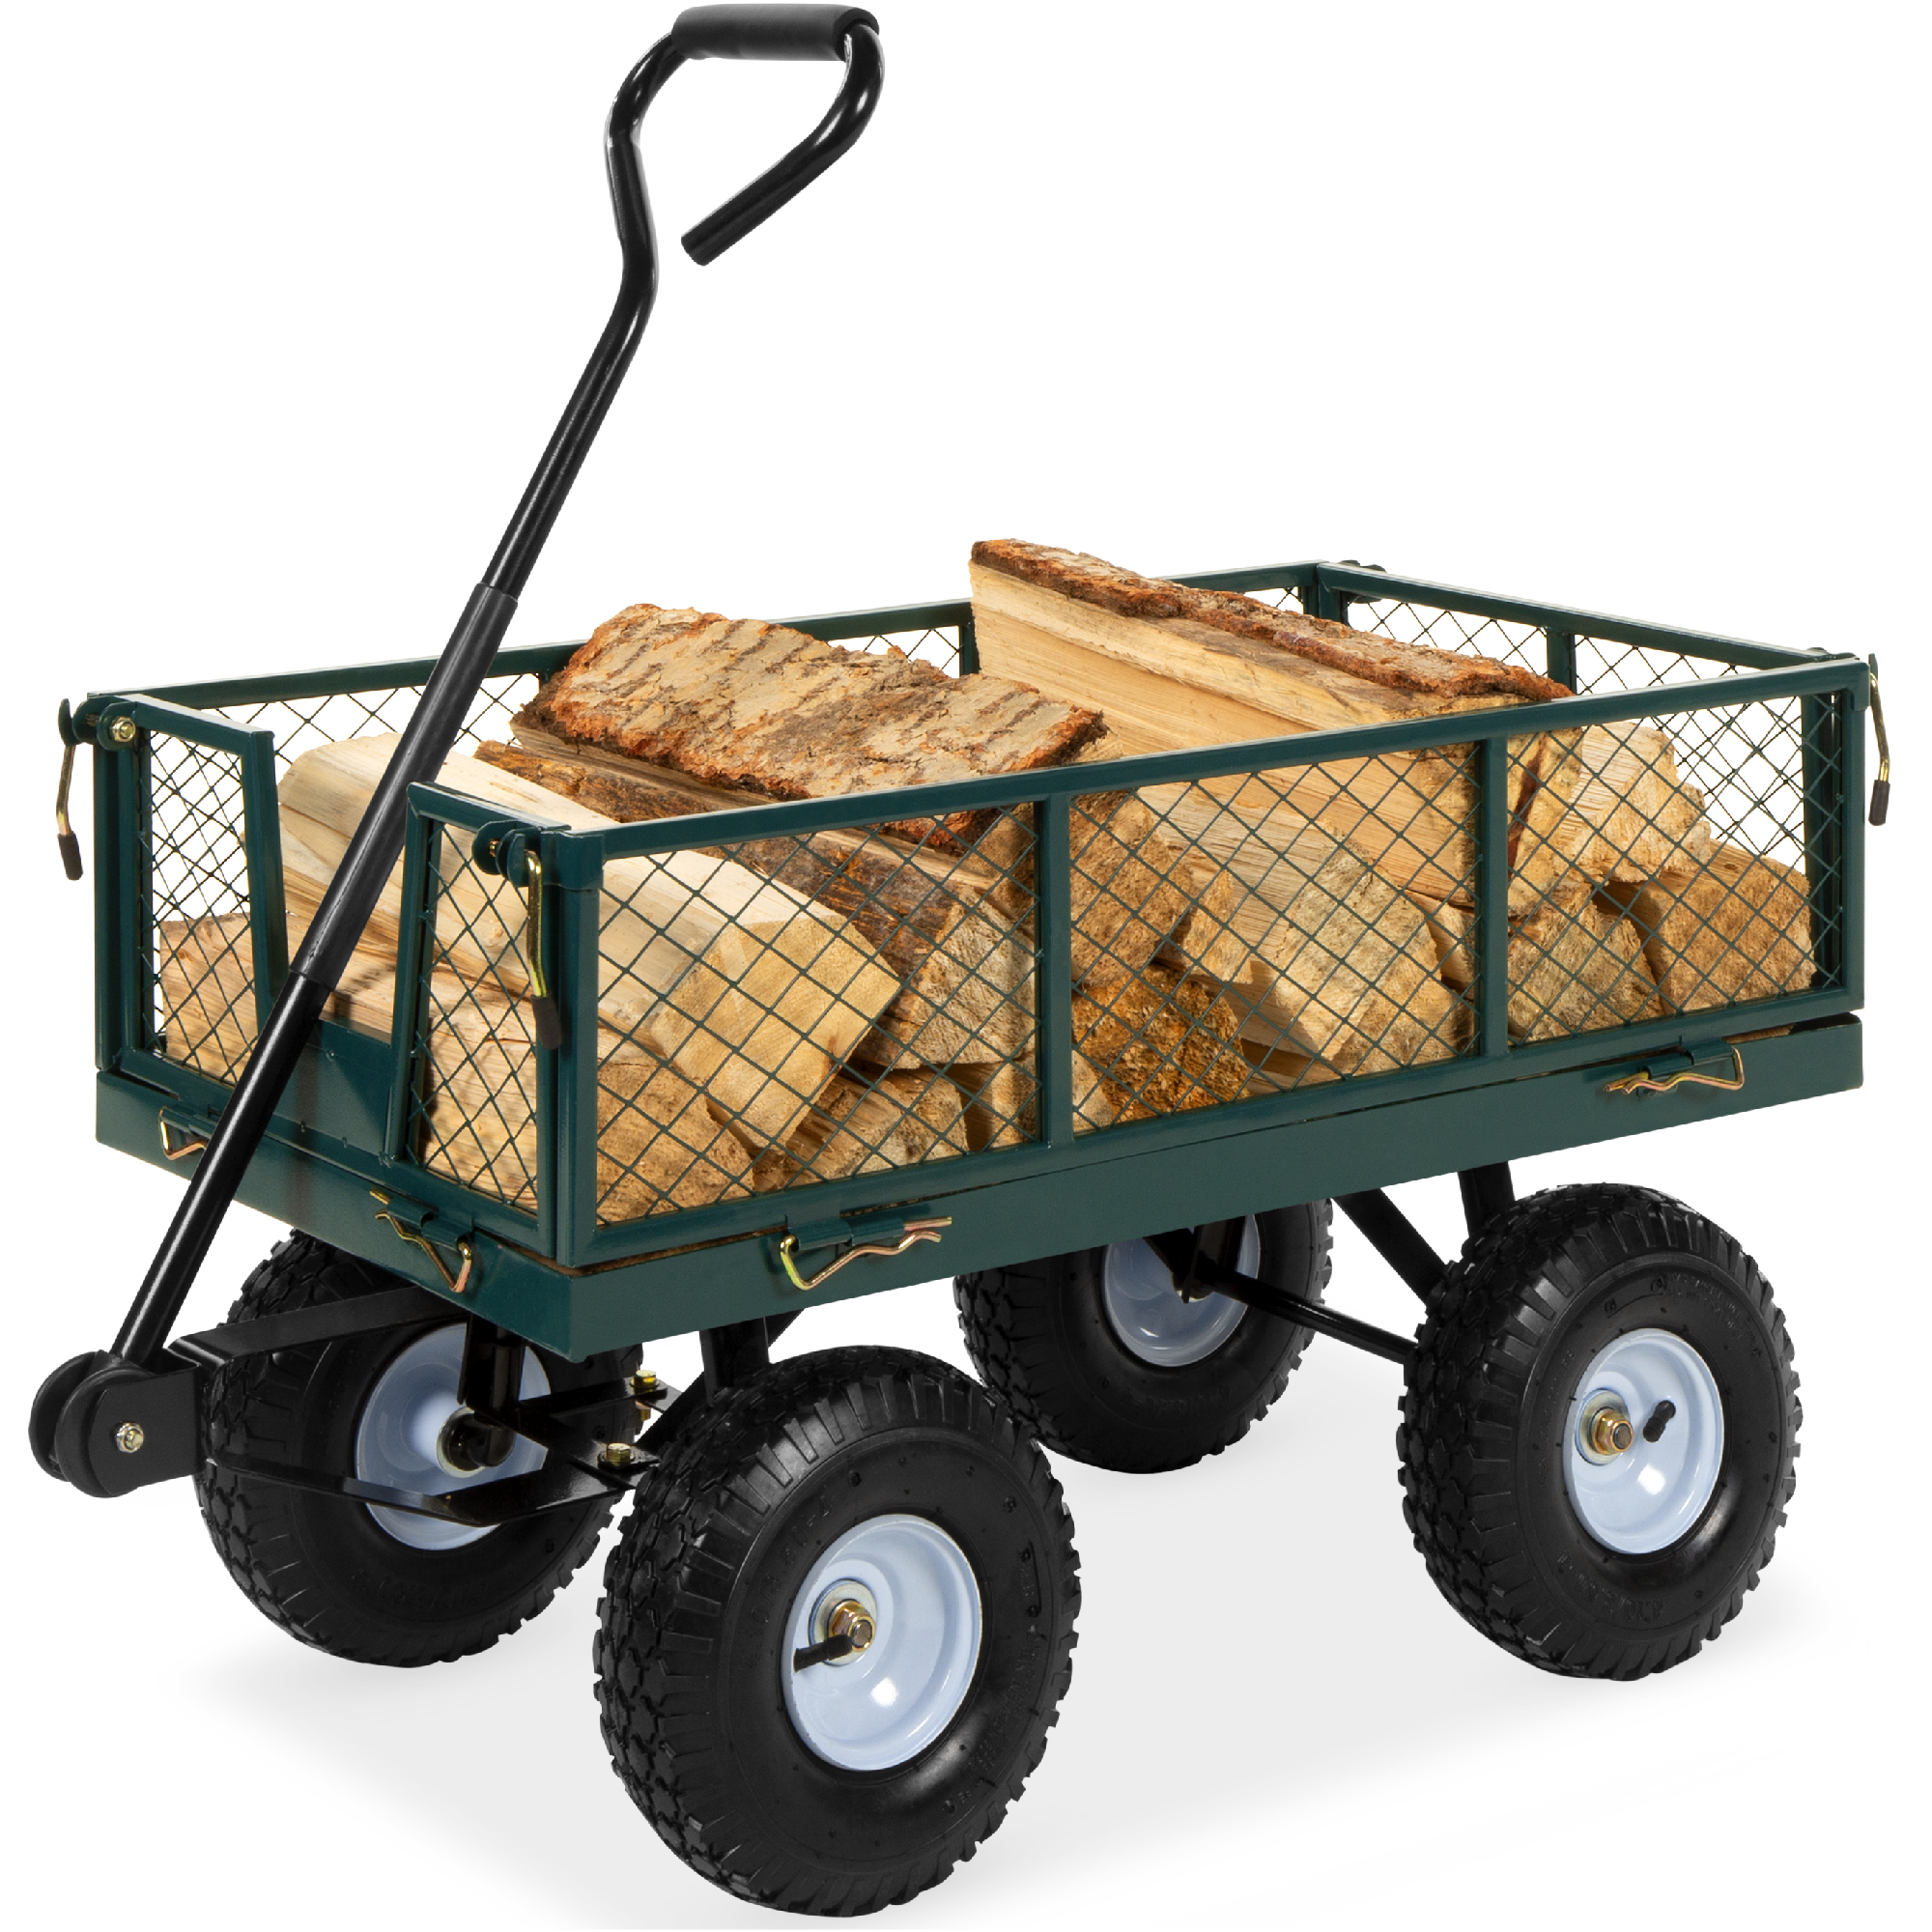 Best Choice Products Heavy Duty Steel Garden Wagon Lawn Utility Cart W 400lb Capacity Removable Sides Handle Green Walmart Com Walmart Com